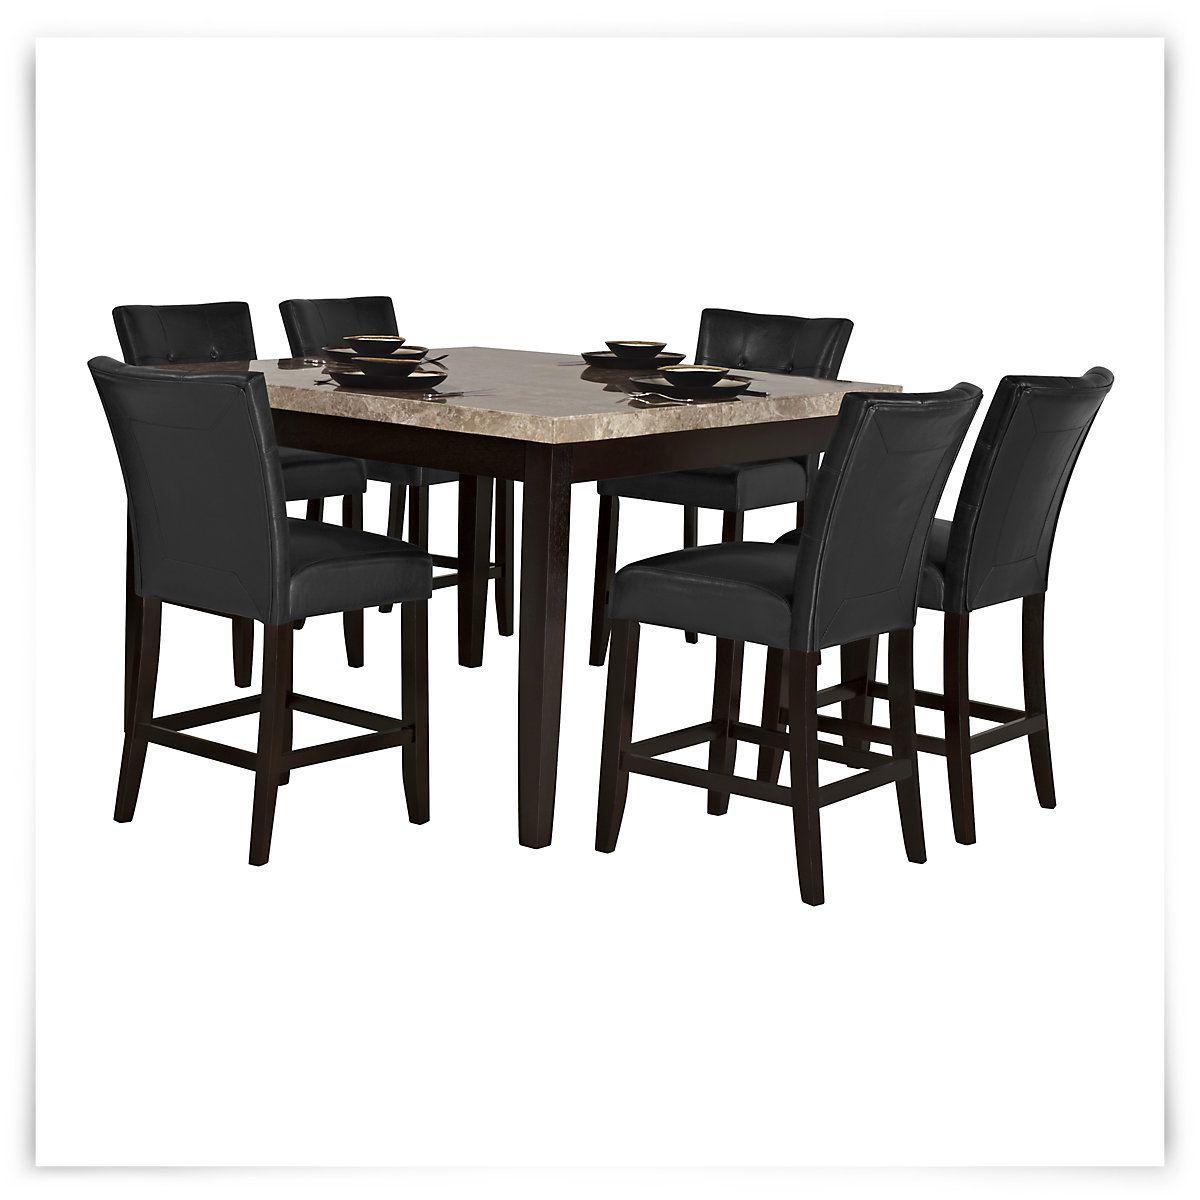 Monark Square Marble High Dining Room High Dining Table Dining Room Table Marble High Dining Table Set